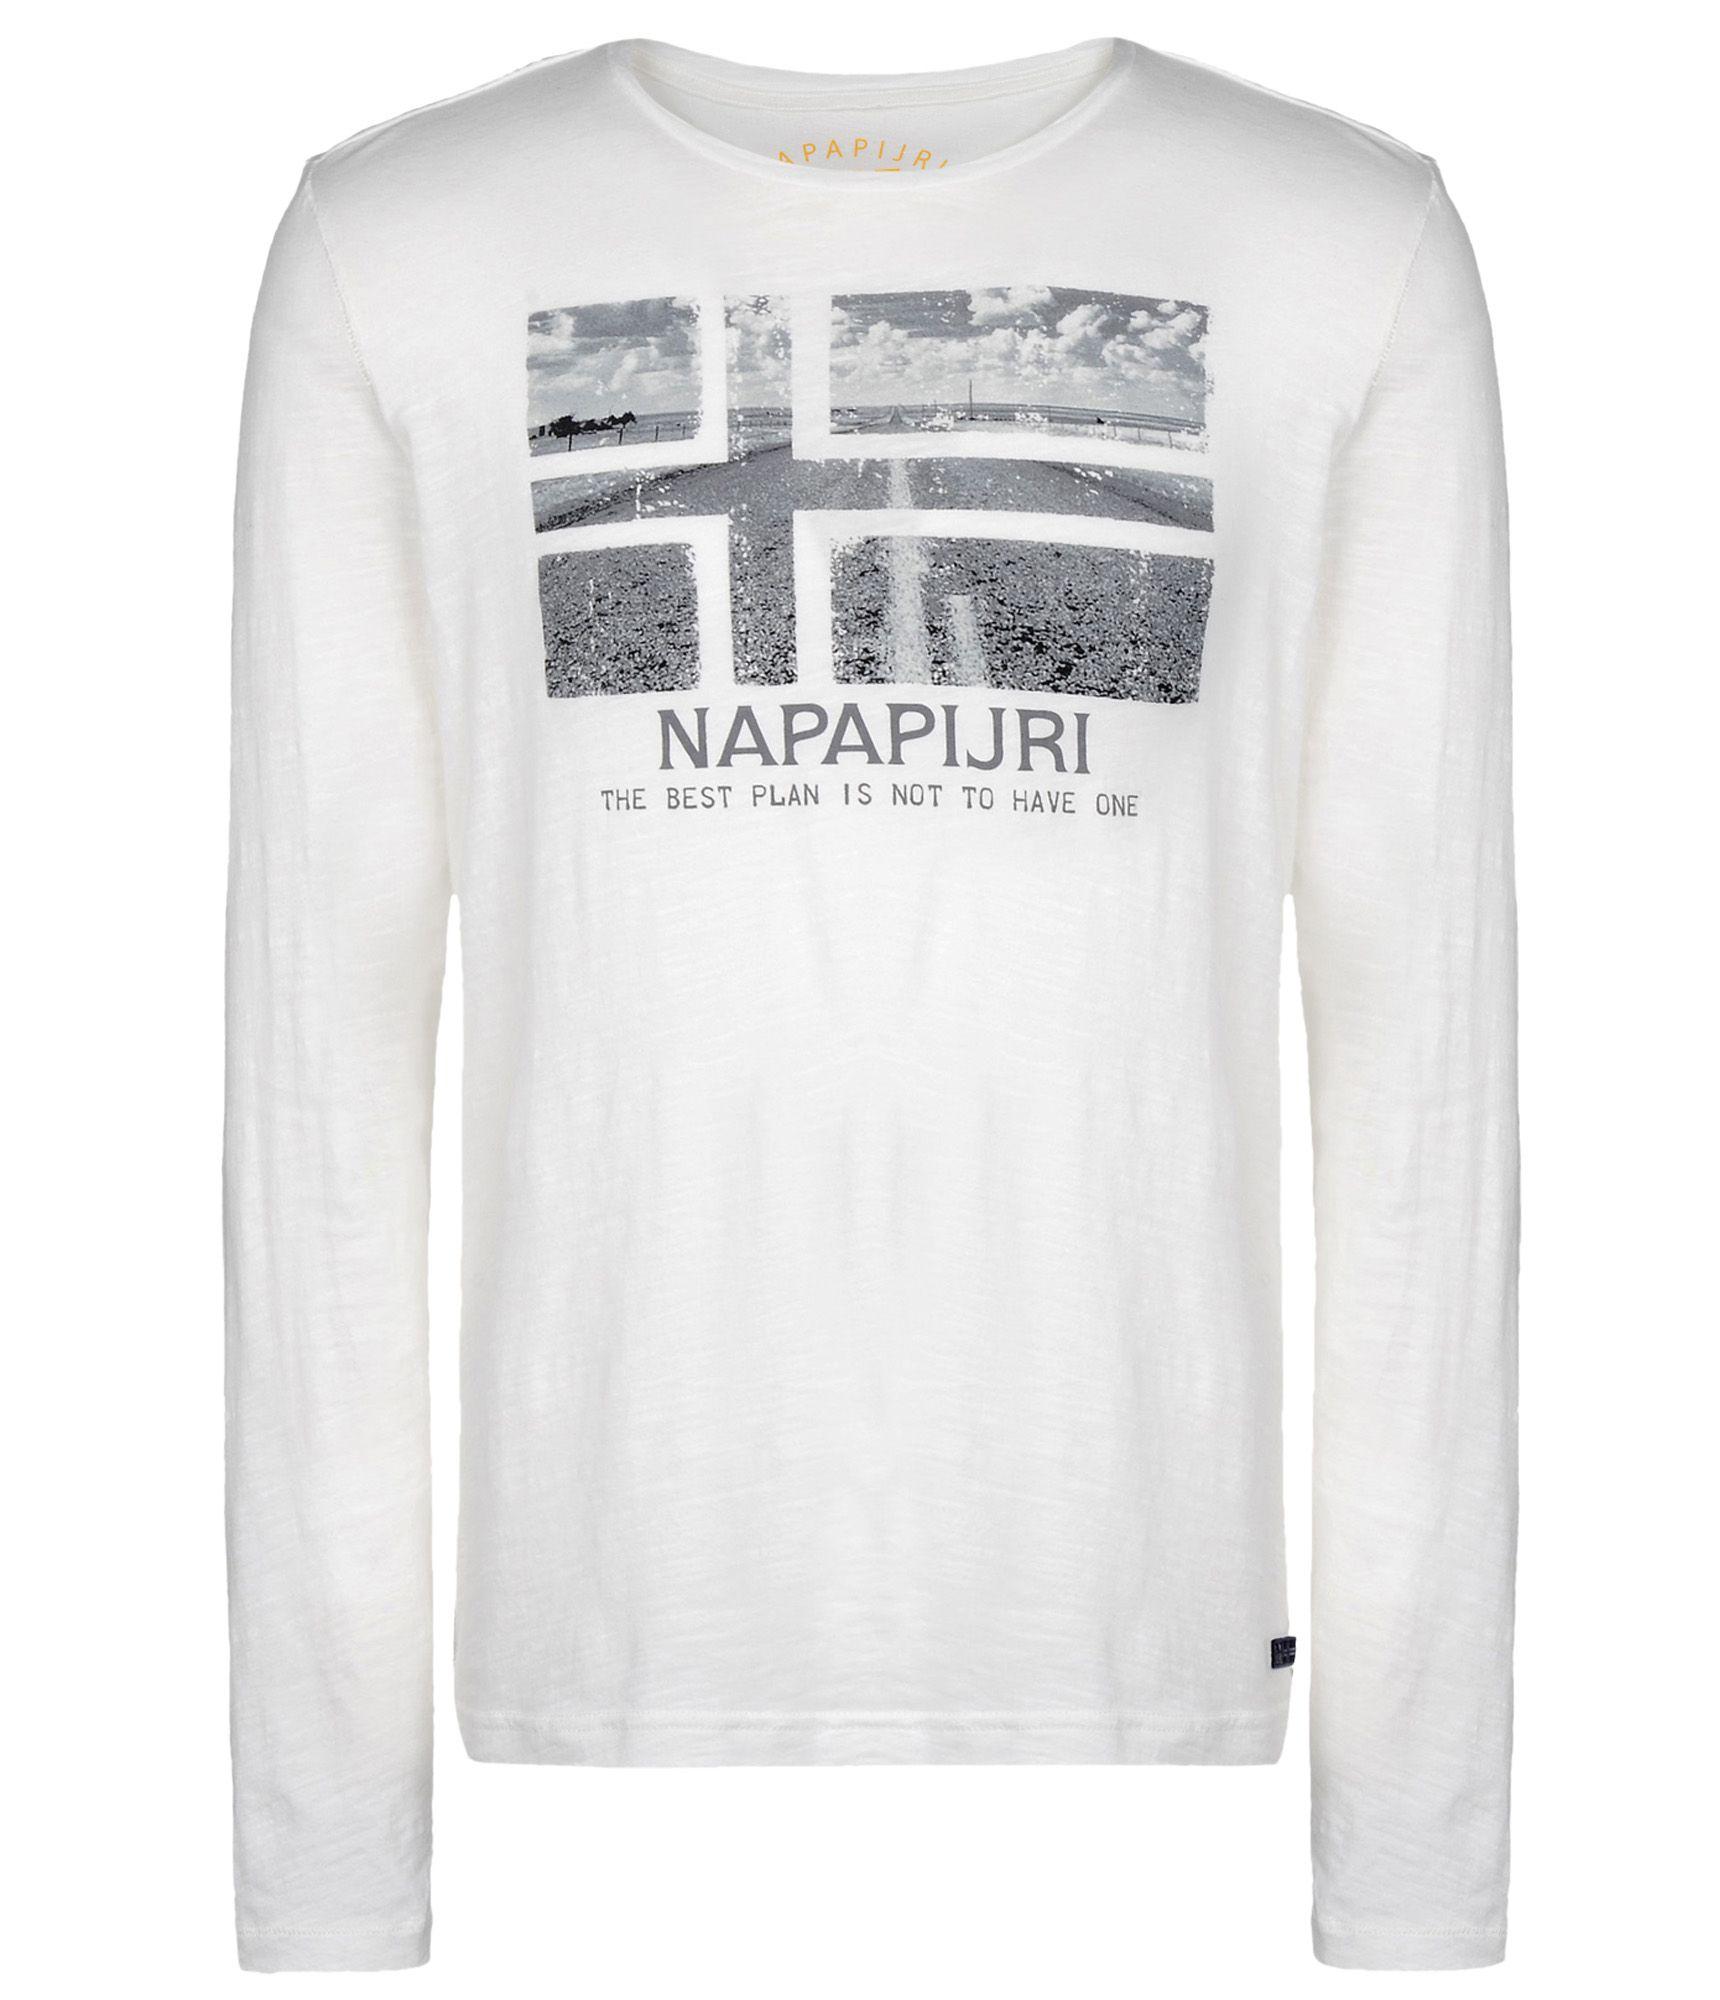 napapijri long sleeve t shirt in white for men lyst. Black Bedroom Furniture Sets. Home Design Ideas